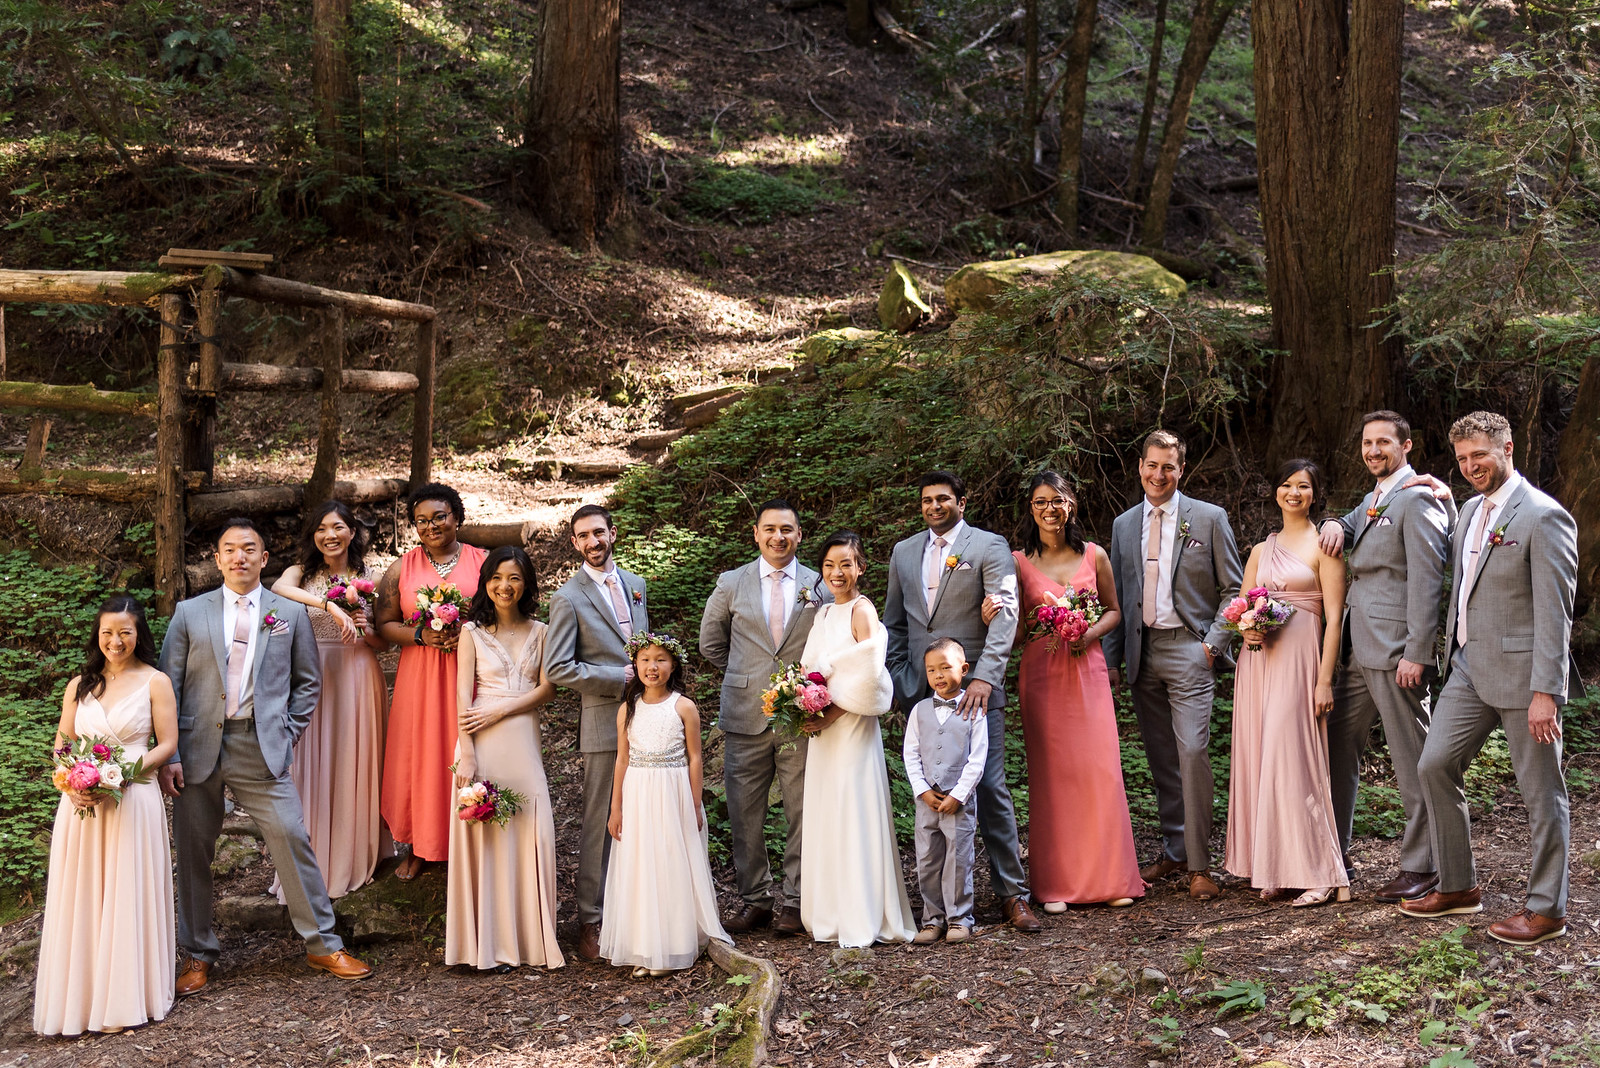 Mismatched Wedding Party on juliettelaura.com